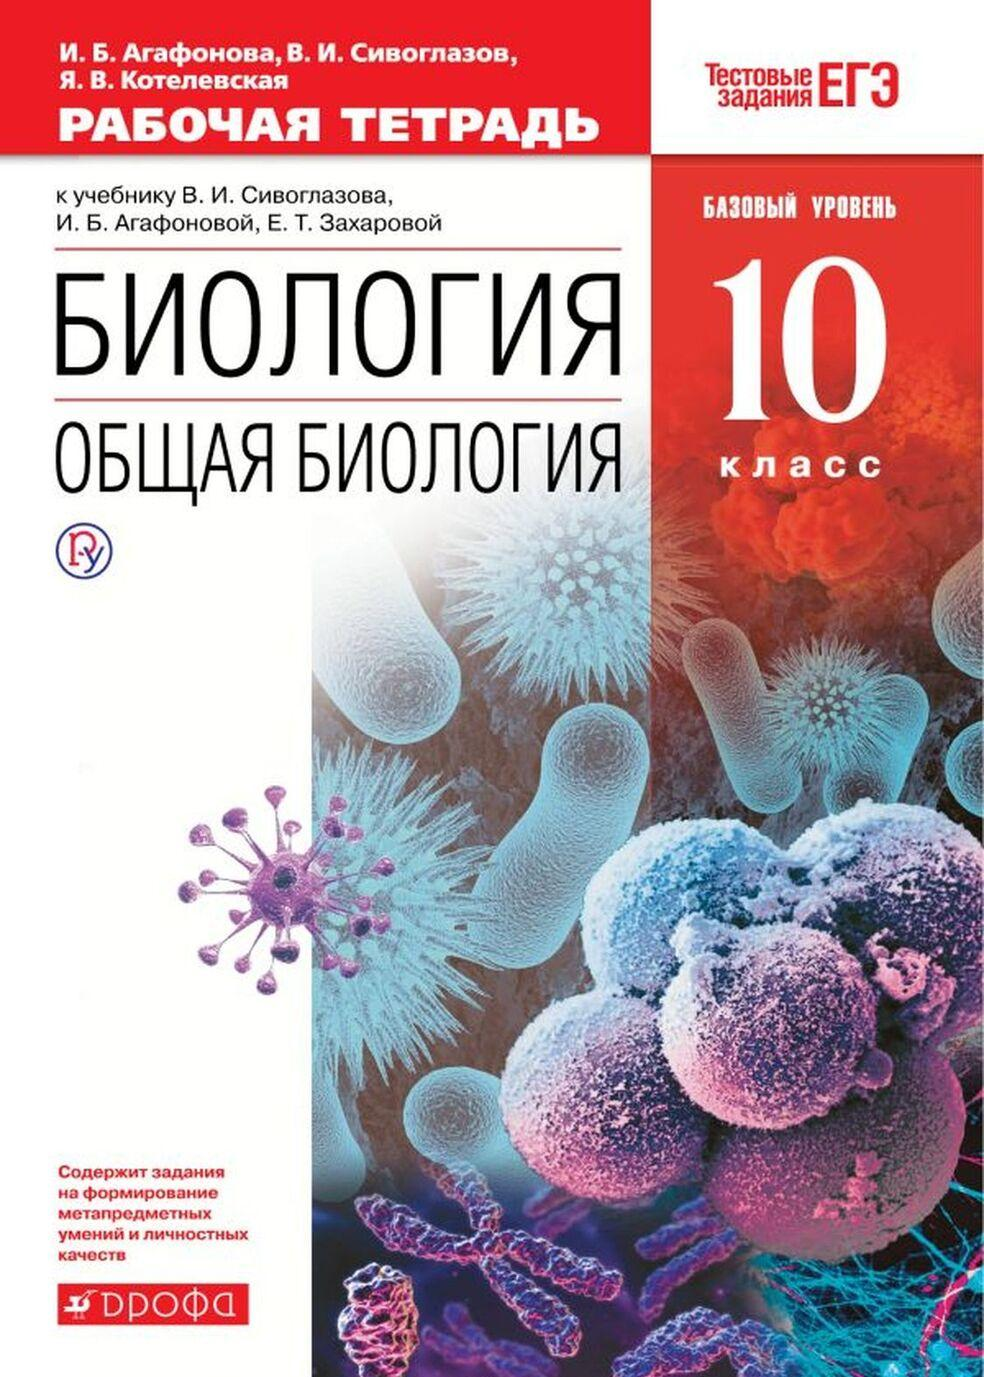 Biologija. Obschaja biologija. 10 klass. Rabochaja tetrad k uchebniku V. I. Sivoglazova, I. B. Agafonovoj, E. T. Zakharovoj. Bazovyj uroven